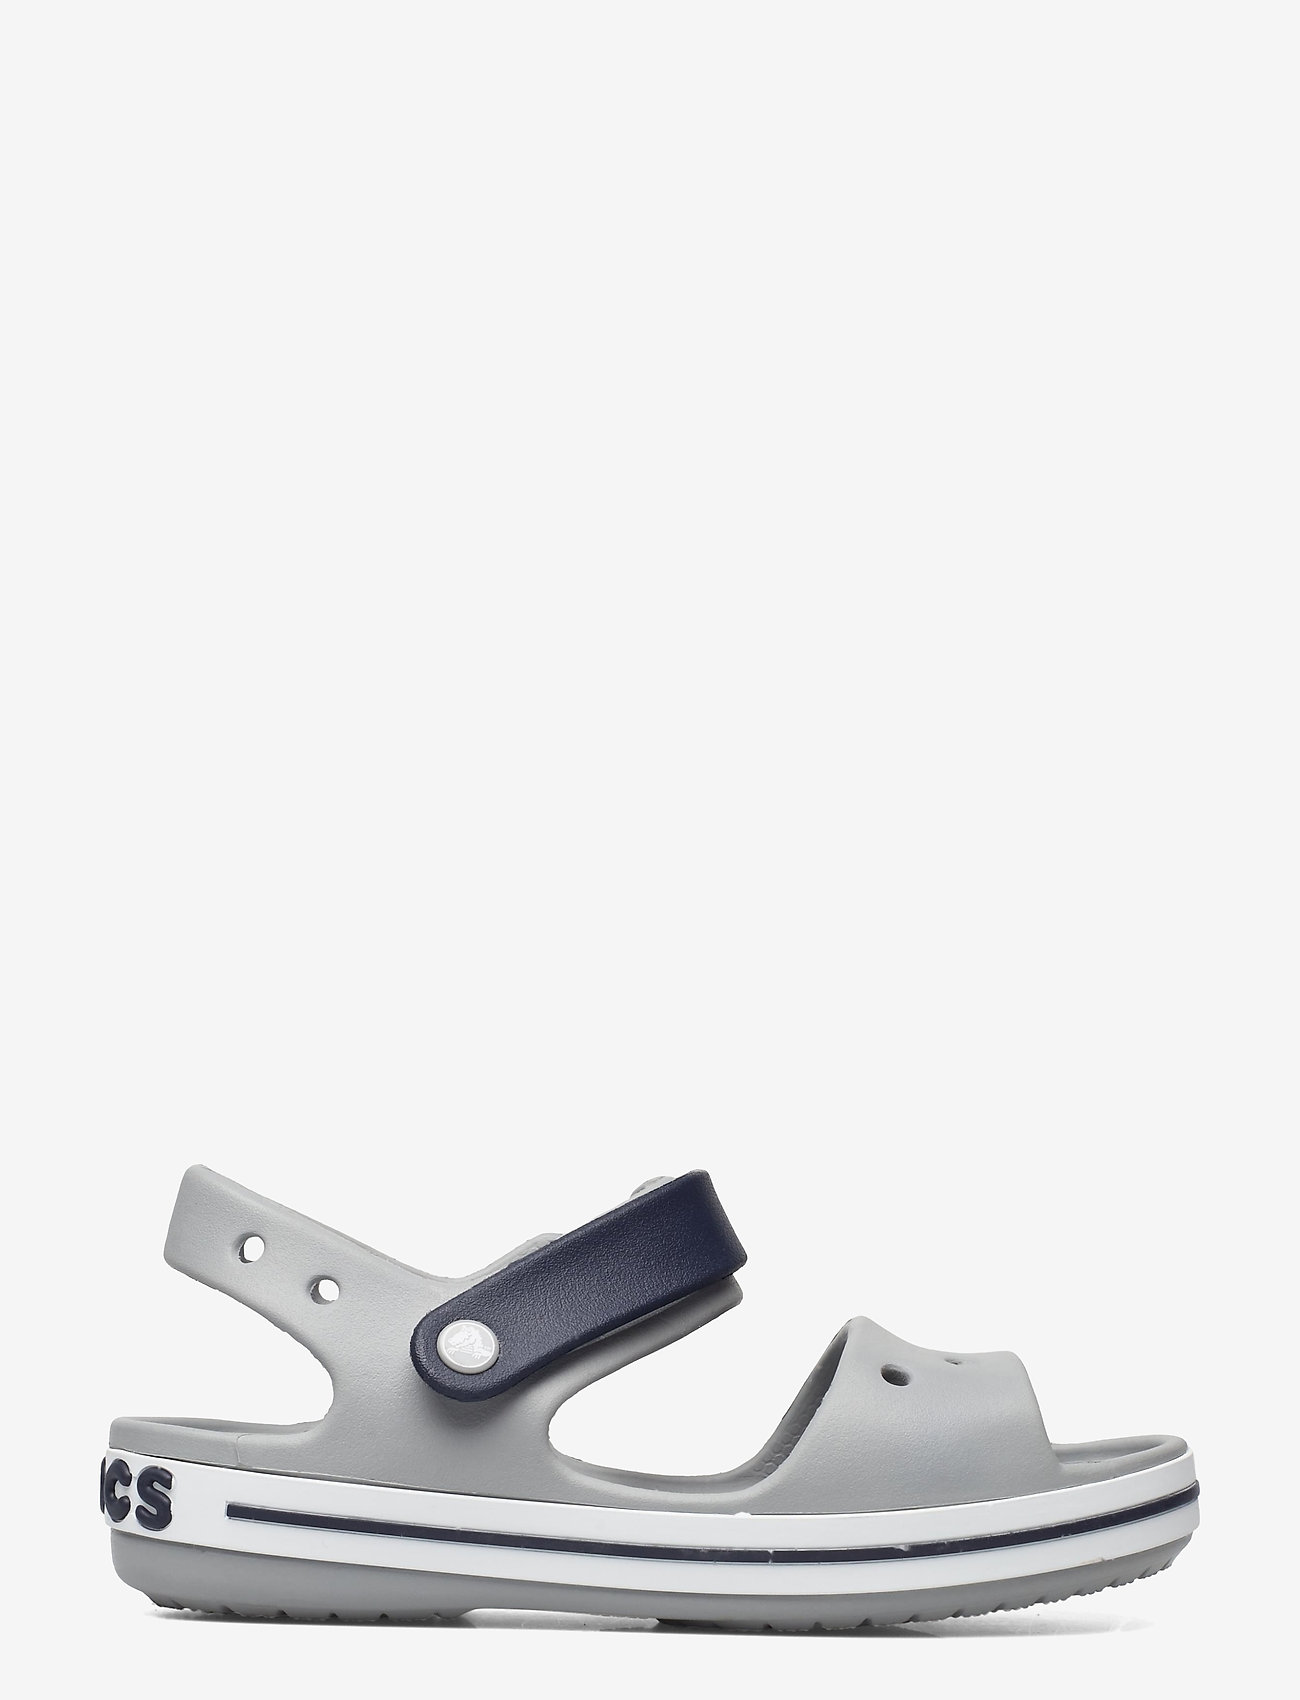 Crocs - Crocband Sandal Kids - light grey/navy - 1